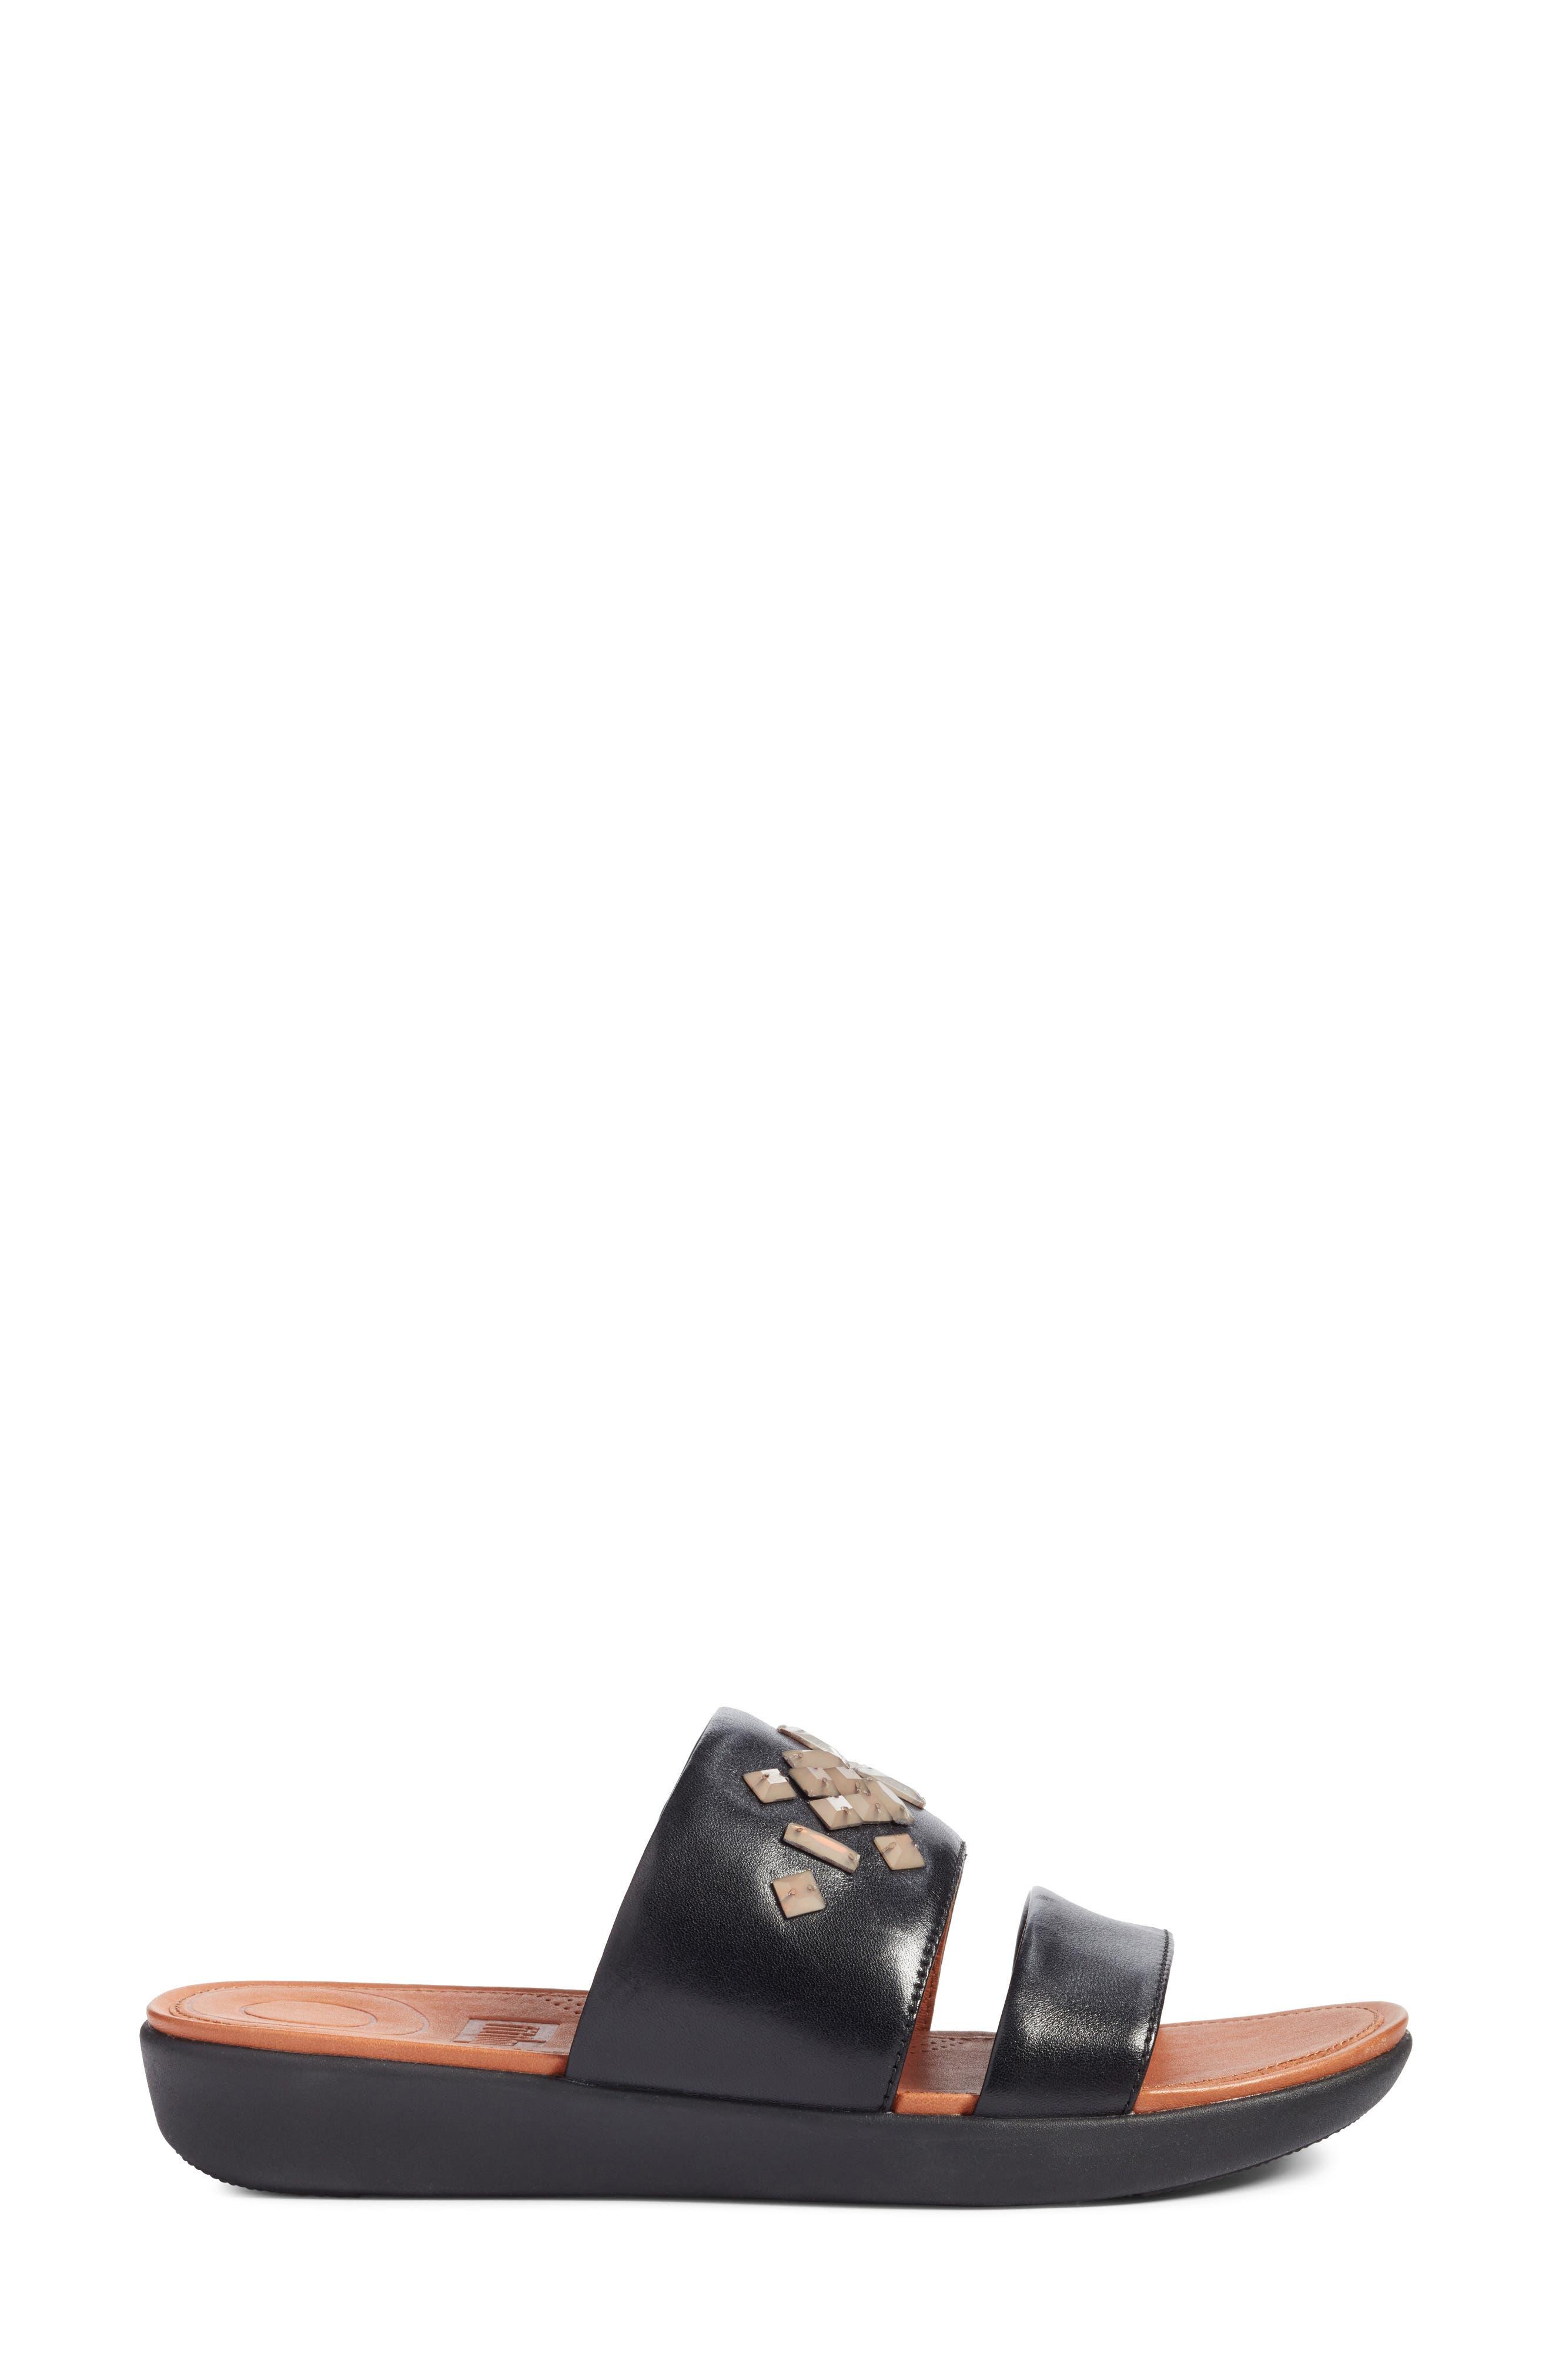 FITFLOP, Delta Slide Sandal, Alternate thumbnail 3, color, 001